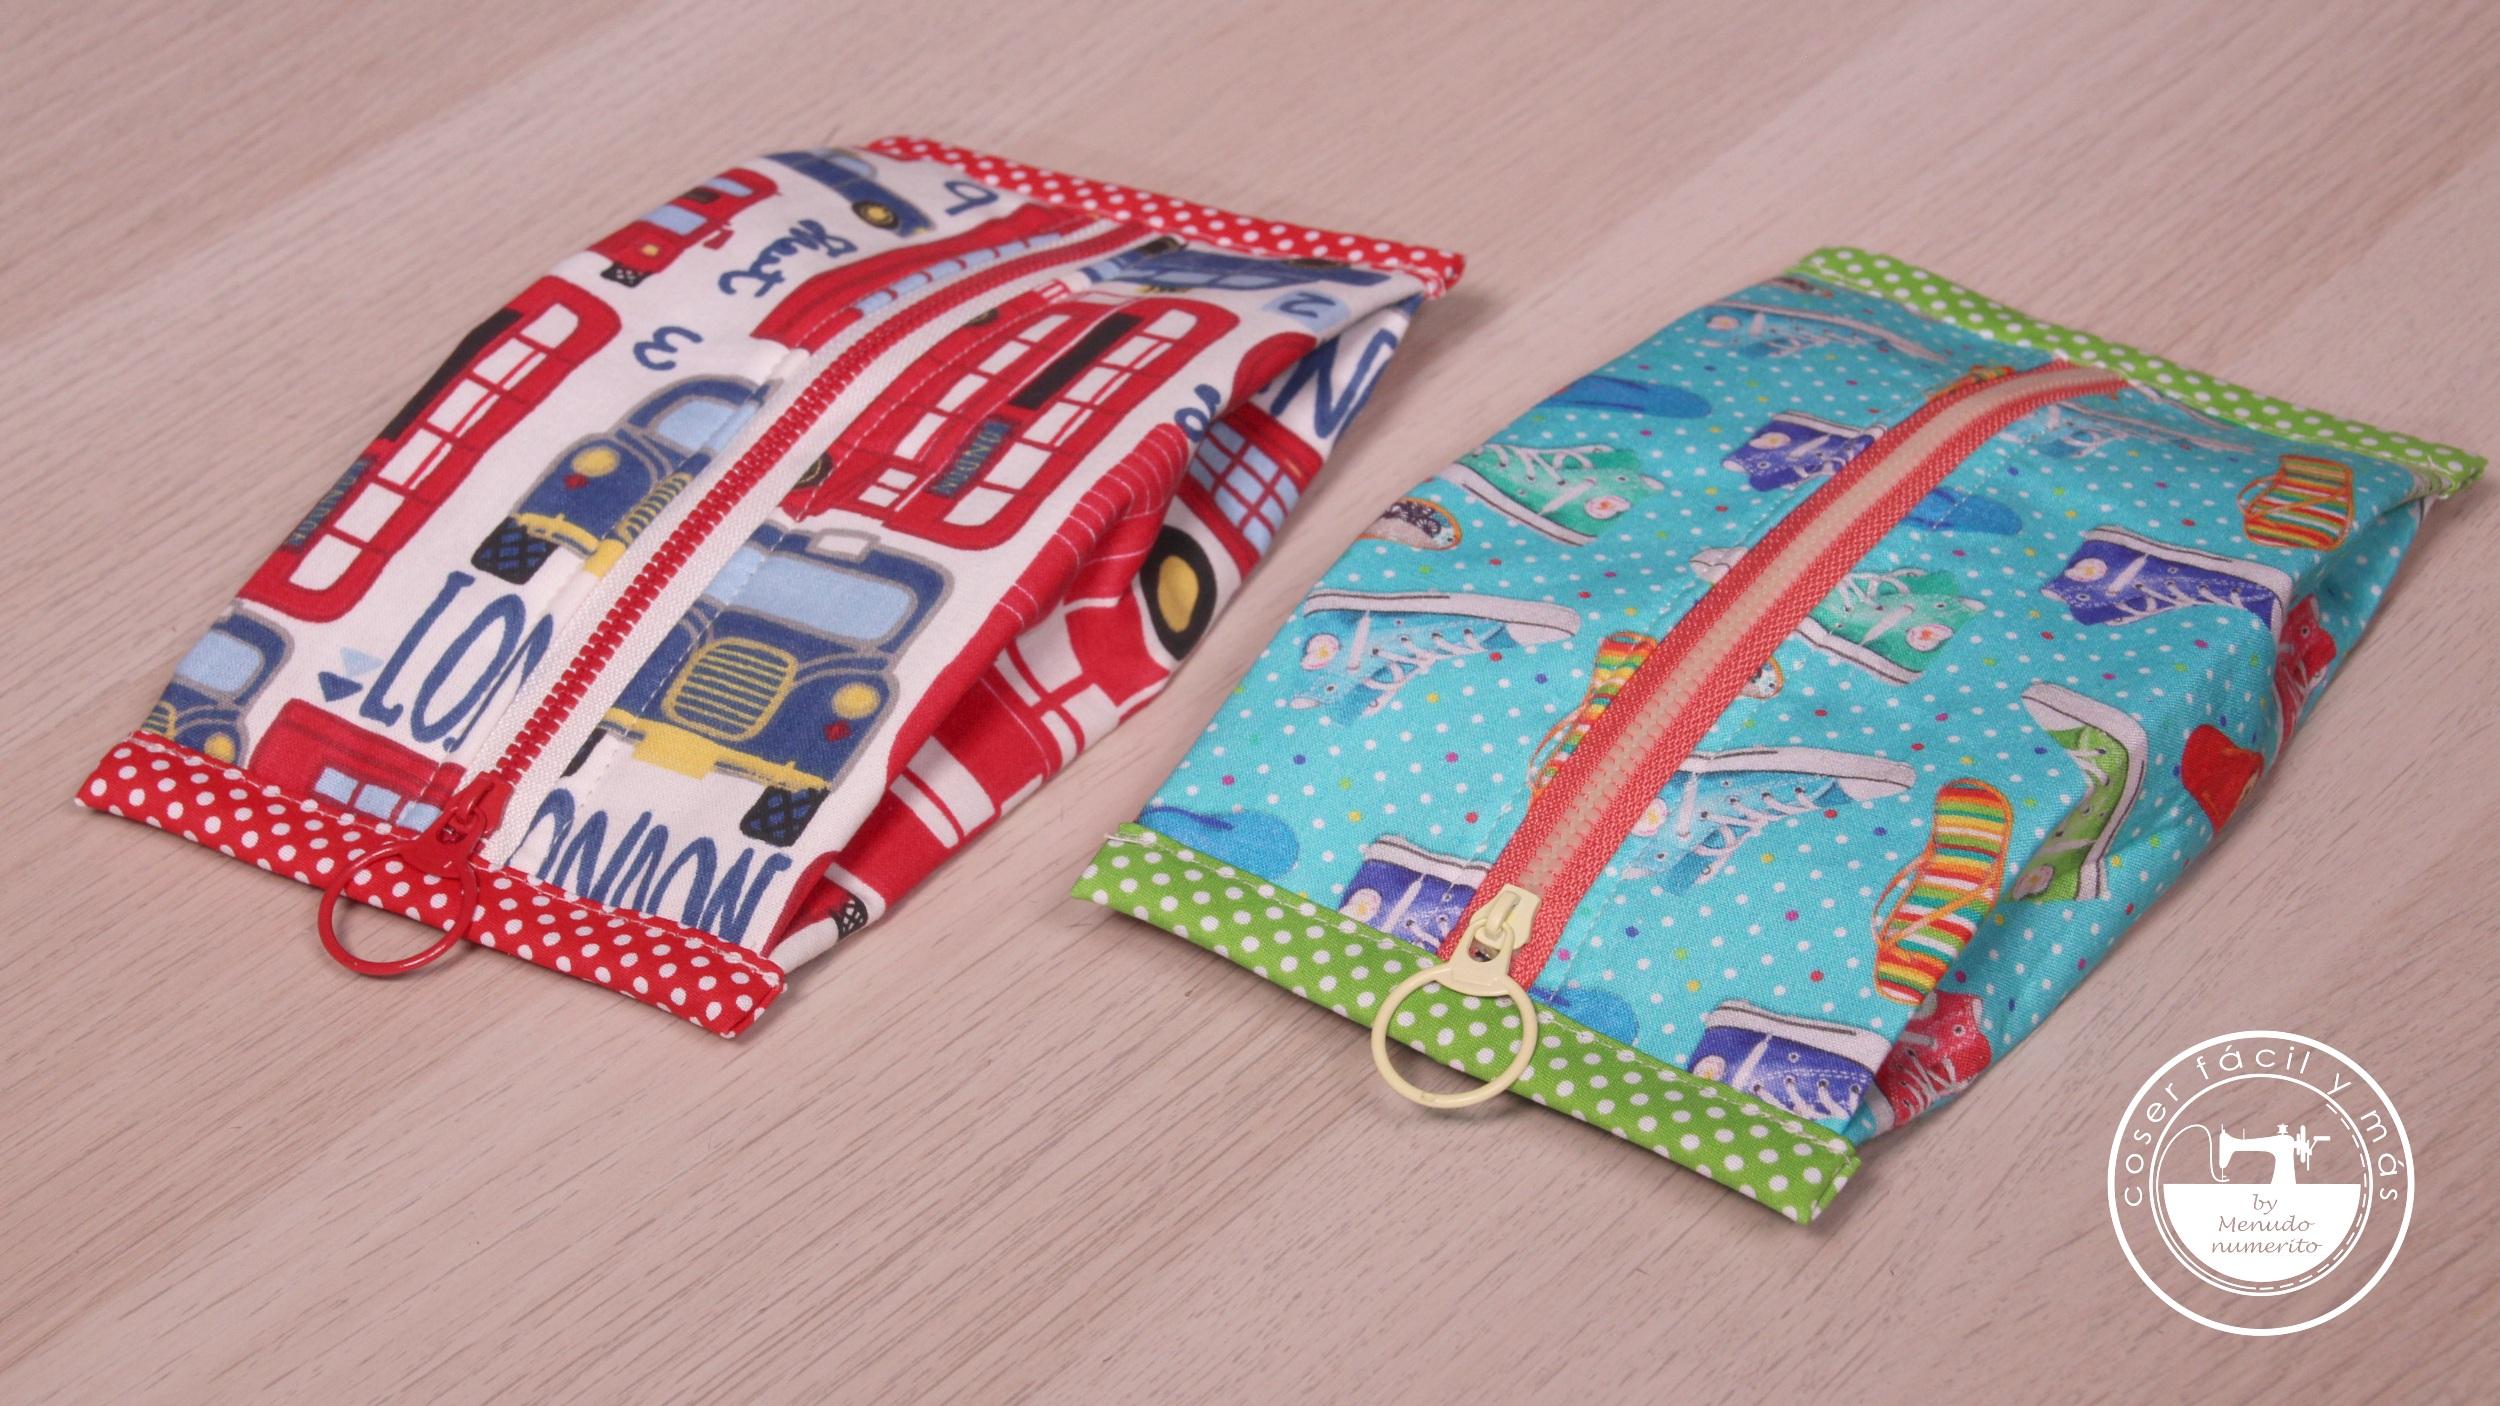 estuche bolsa de palomitas coser facil menudo numerito blogs de costura tutorial